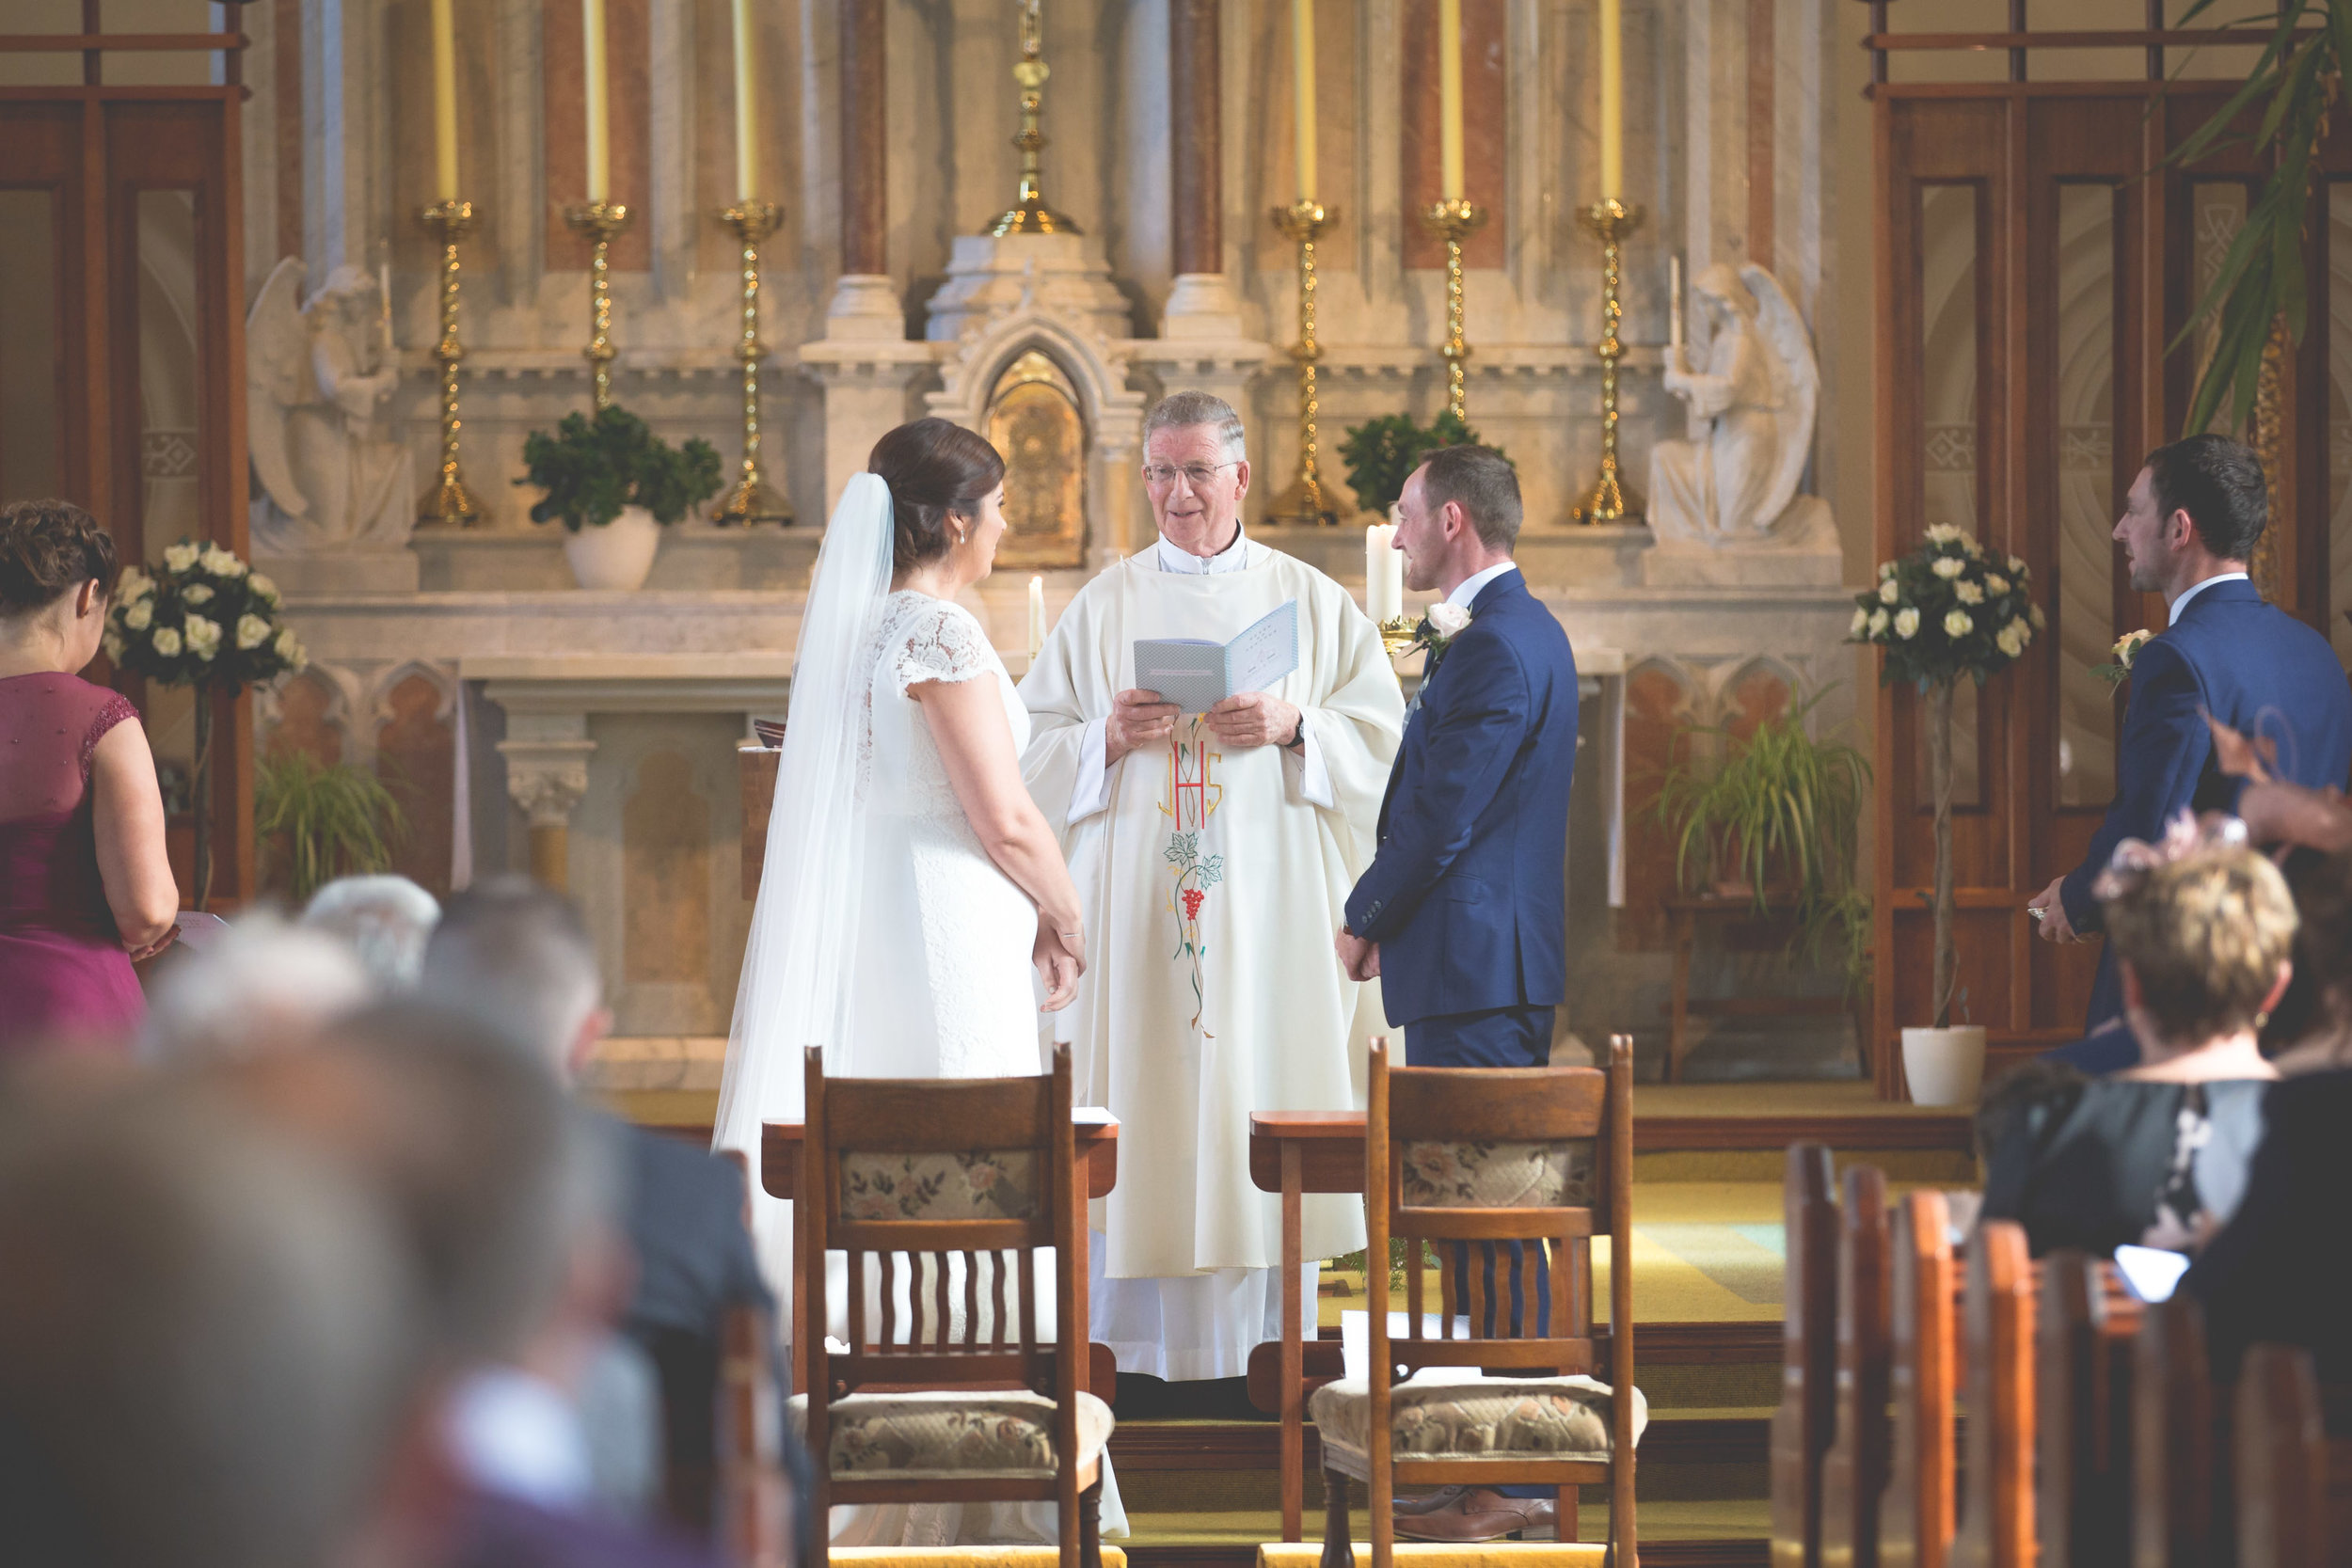 Johann & Terry - Ceremony-69.jpg